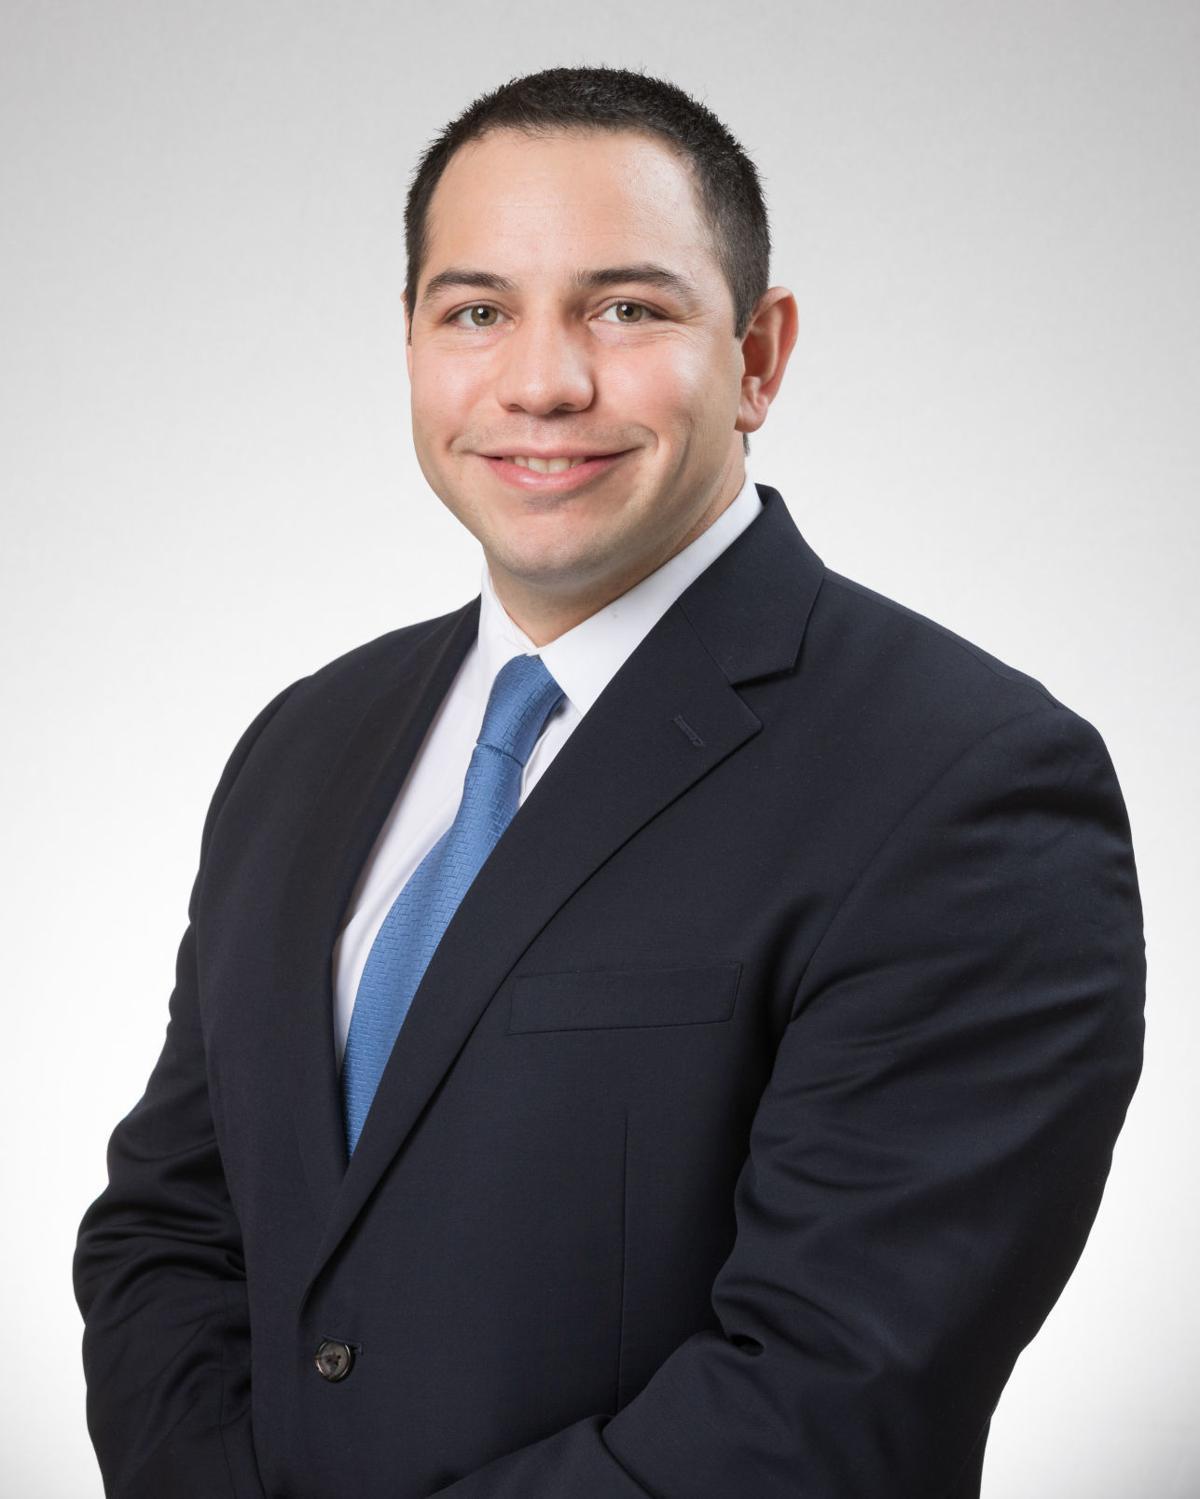 Rep. Shane Morigeau